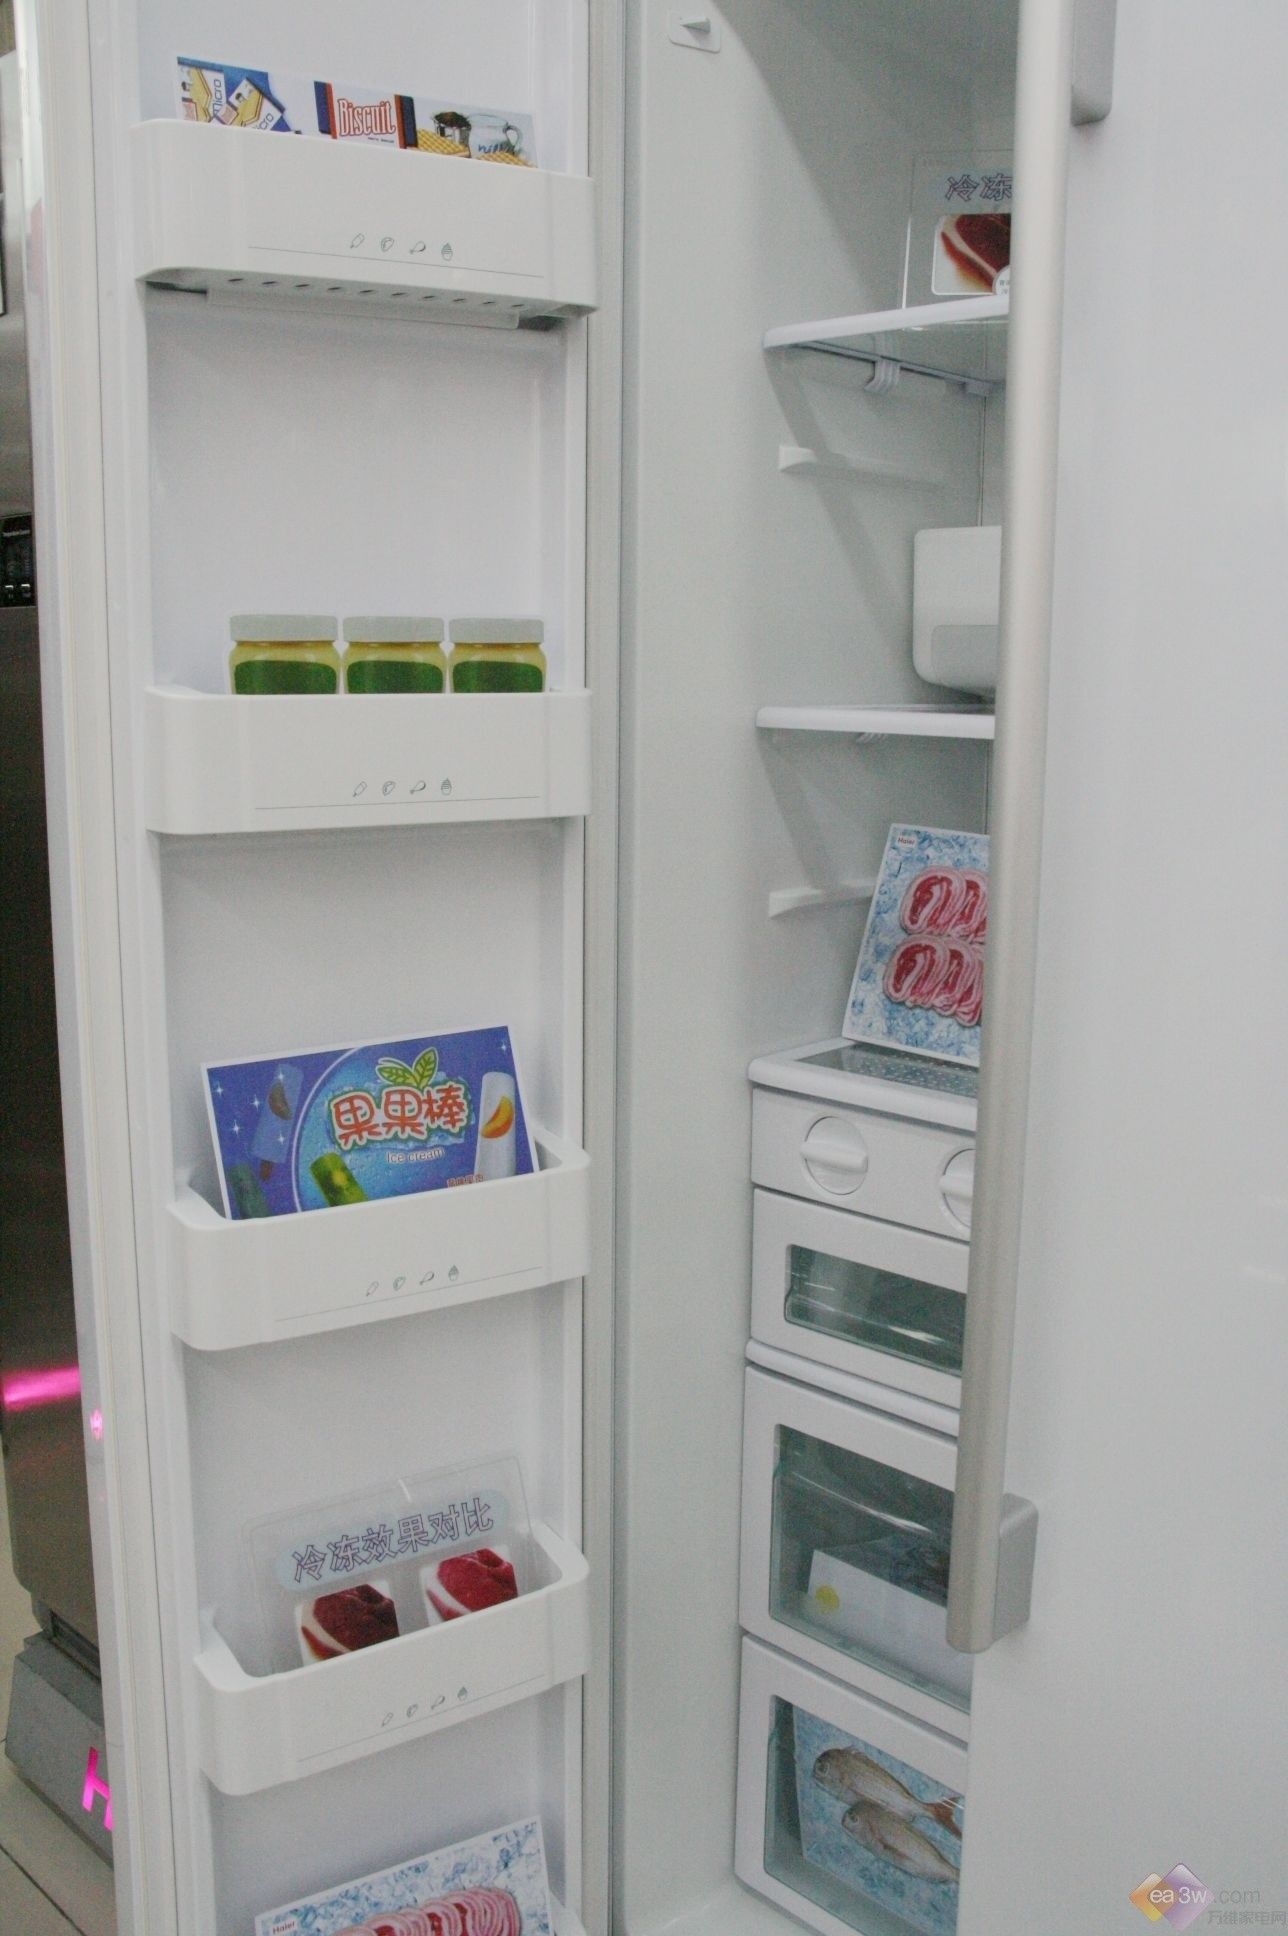 海尔冰箱579we风机电路图